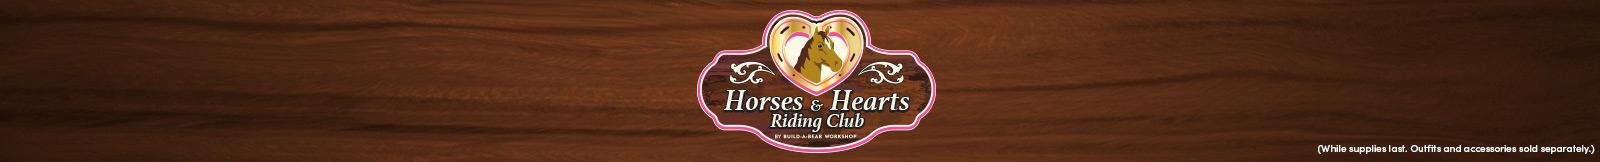 Horses and Hearts